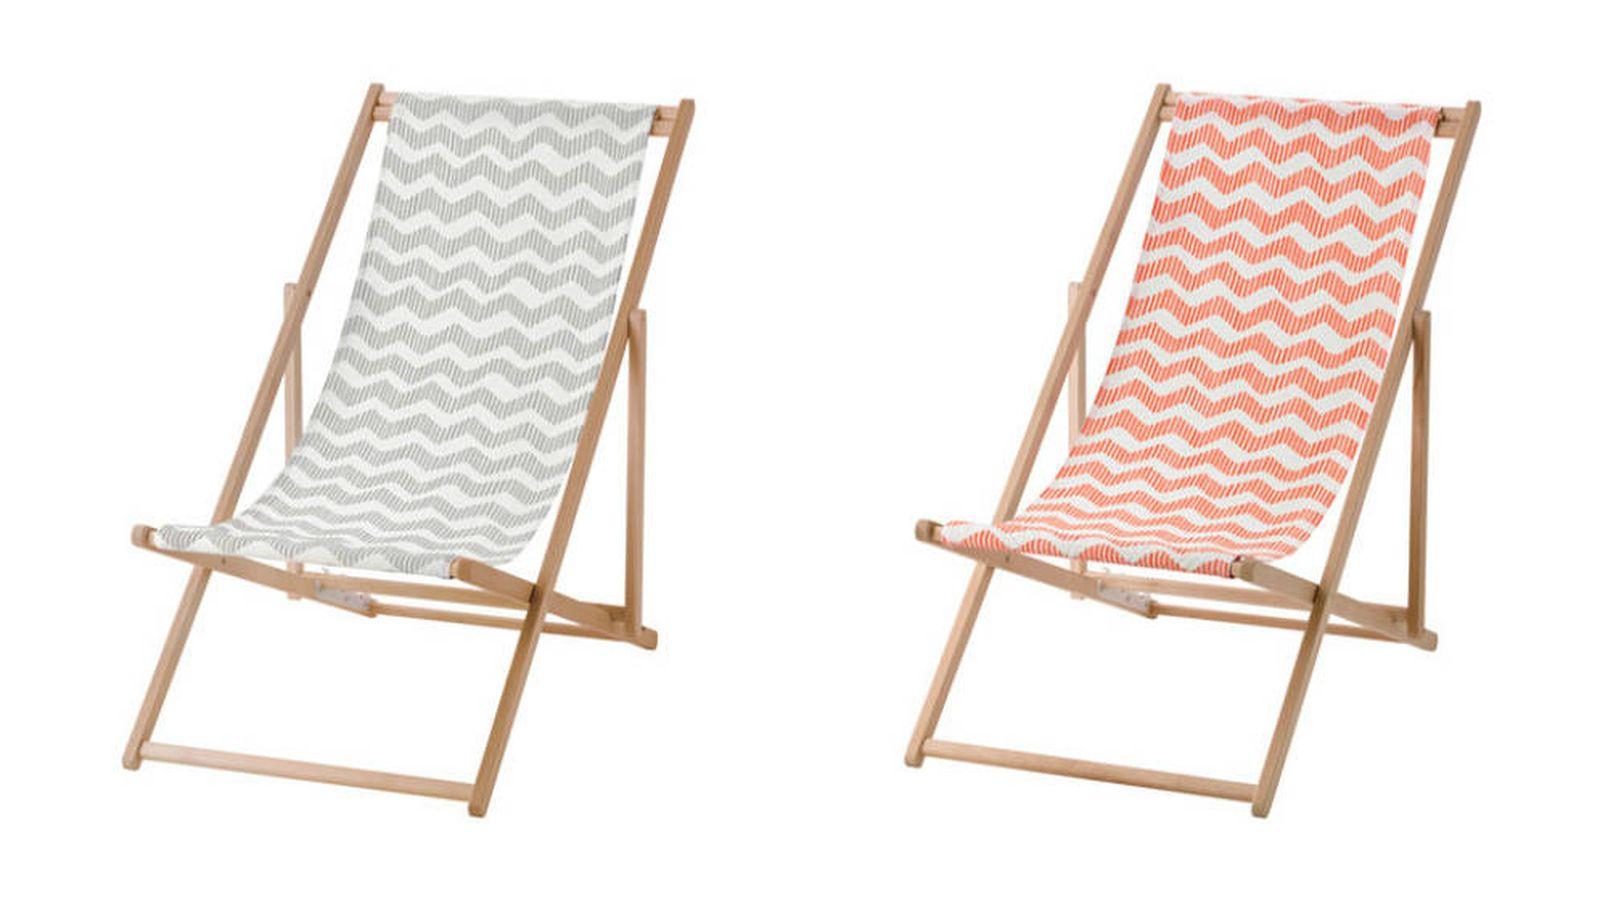 Accidentes ikea retira sus sillas de playa mysings tras - Sillas de playa plegables en ikea ...